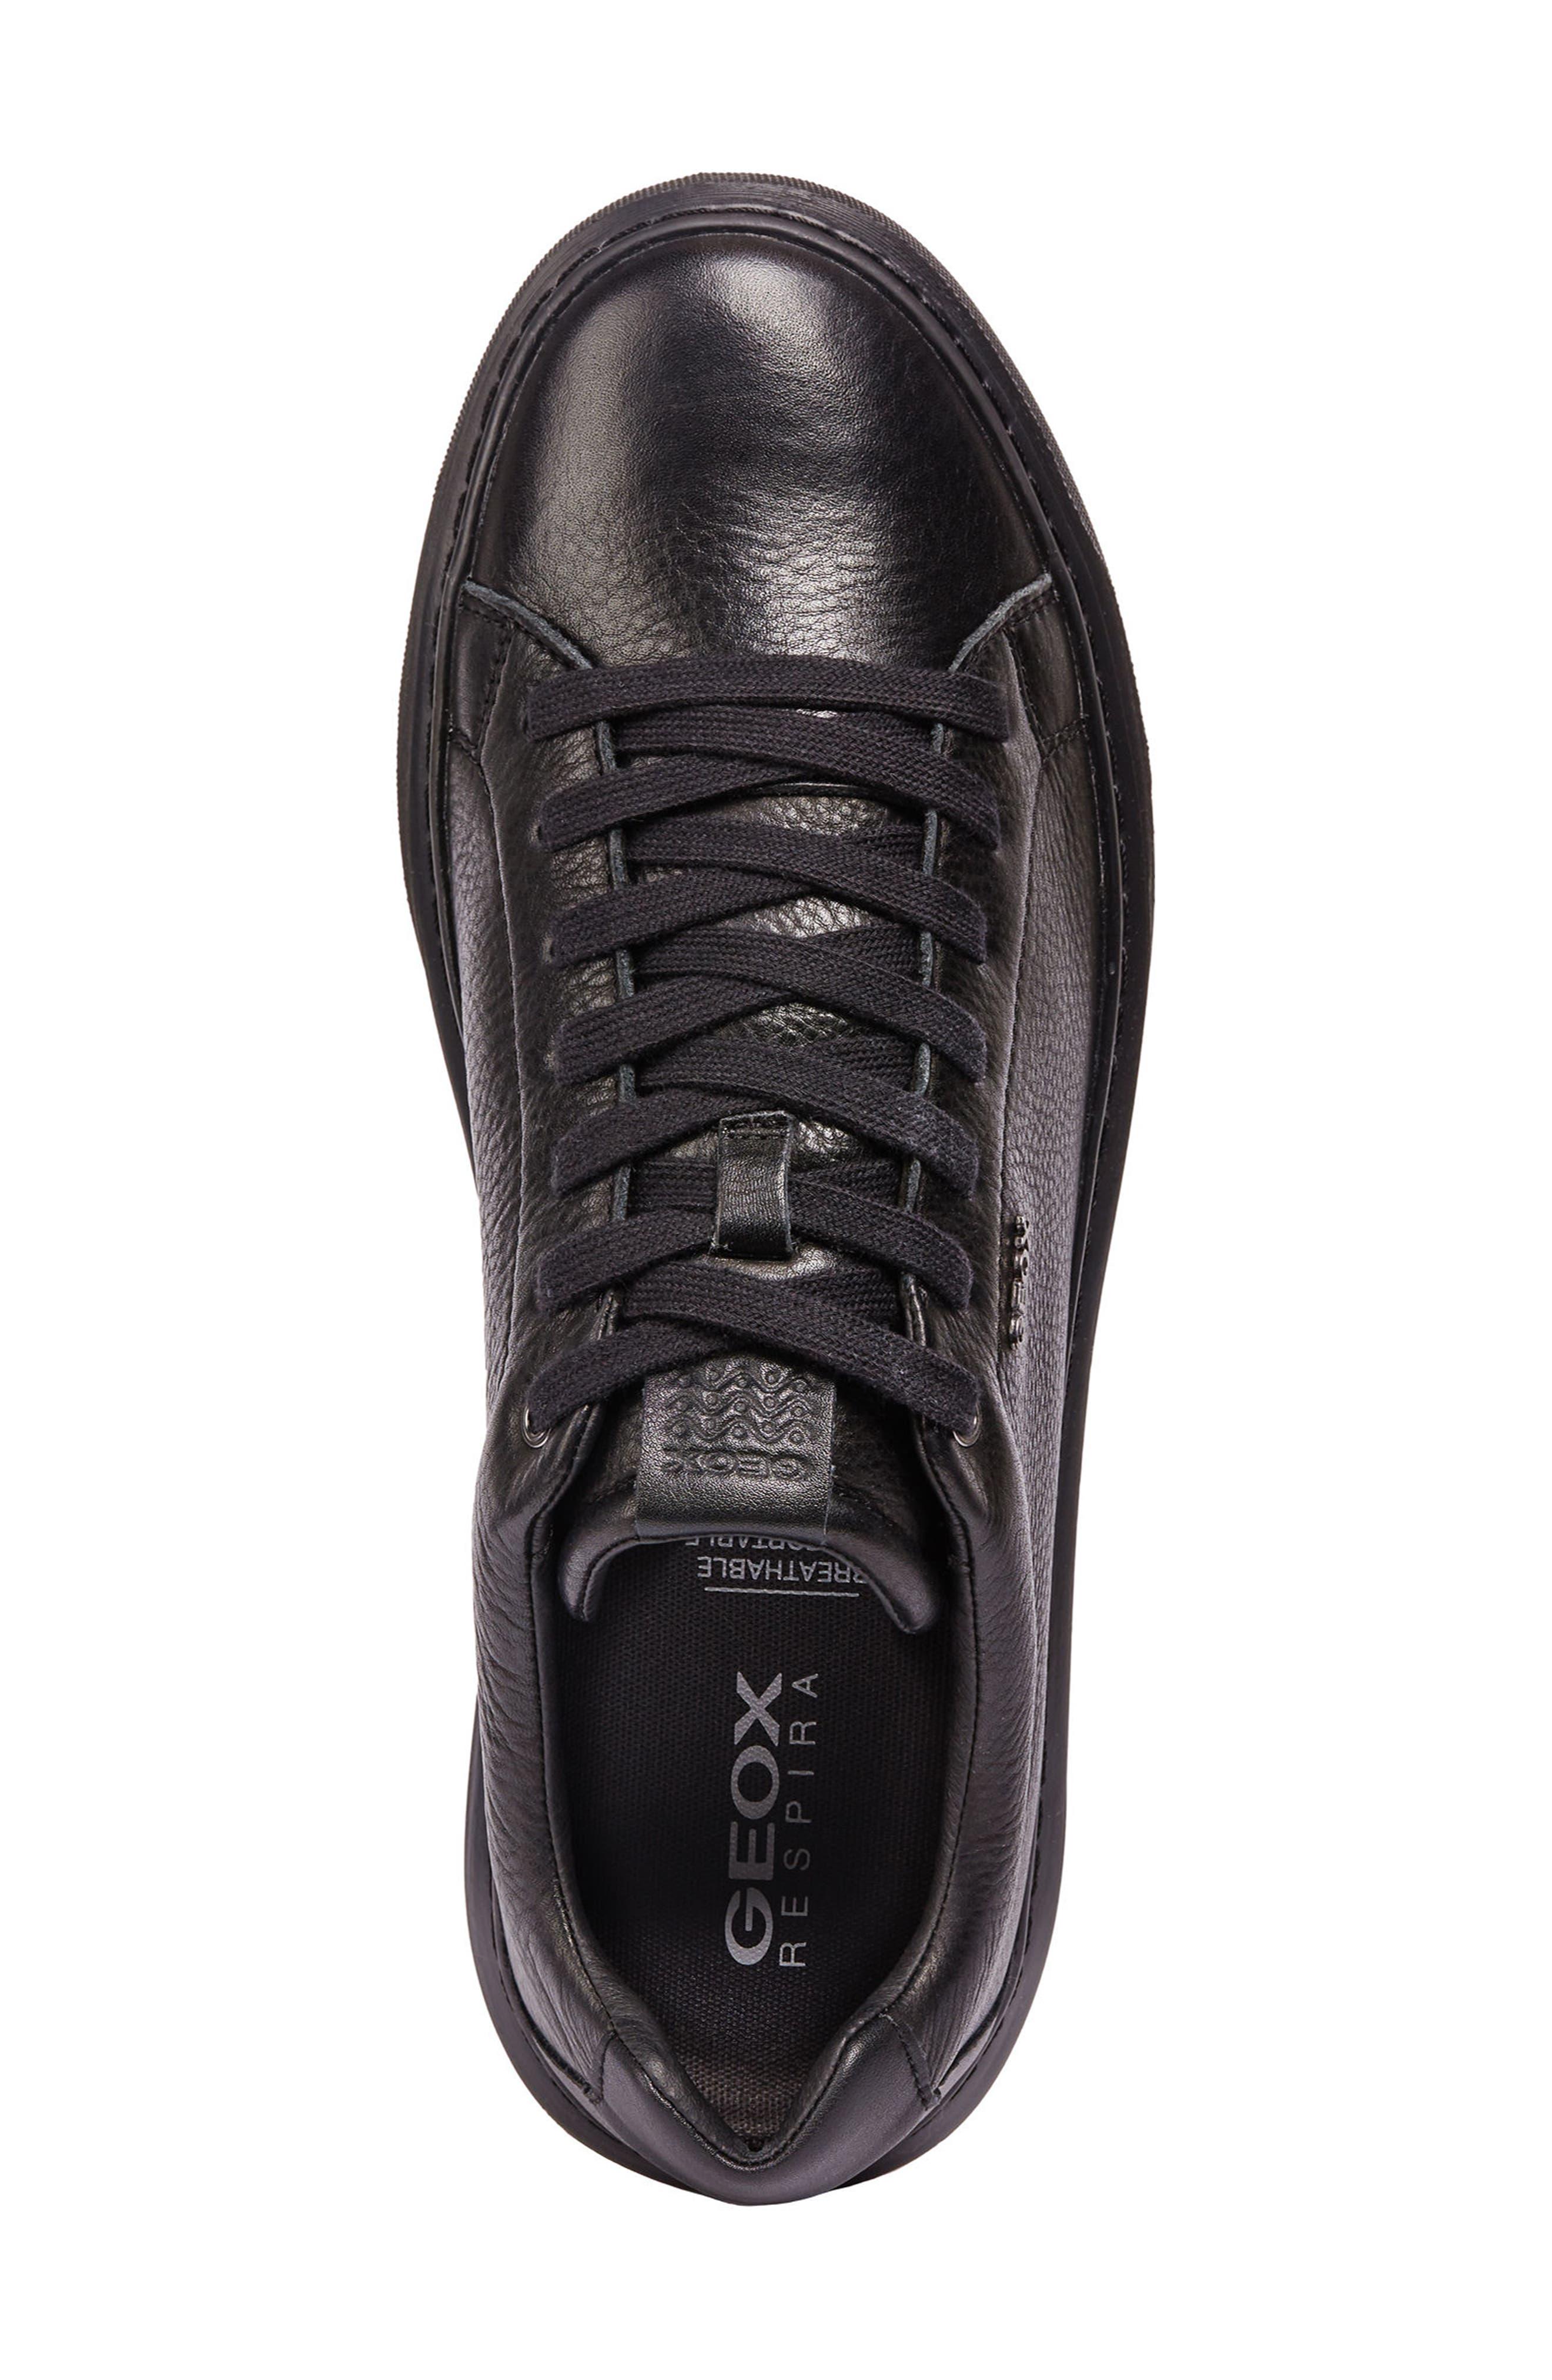 Deiven 4 Low Top Sneaker,                             Alternate thumbnail 5, color,                             BLACK LEATHER